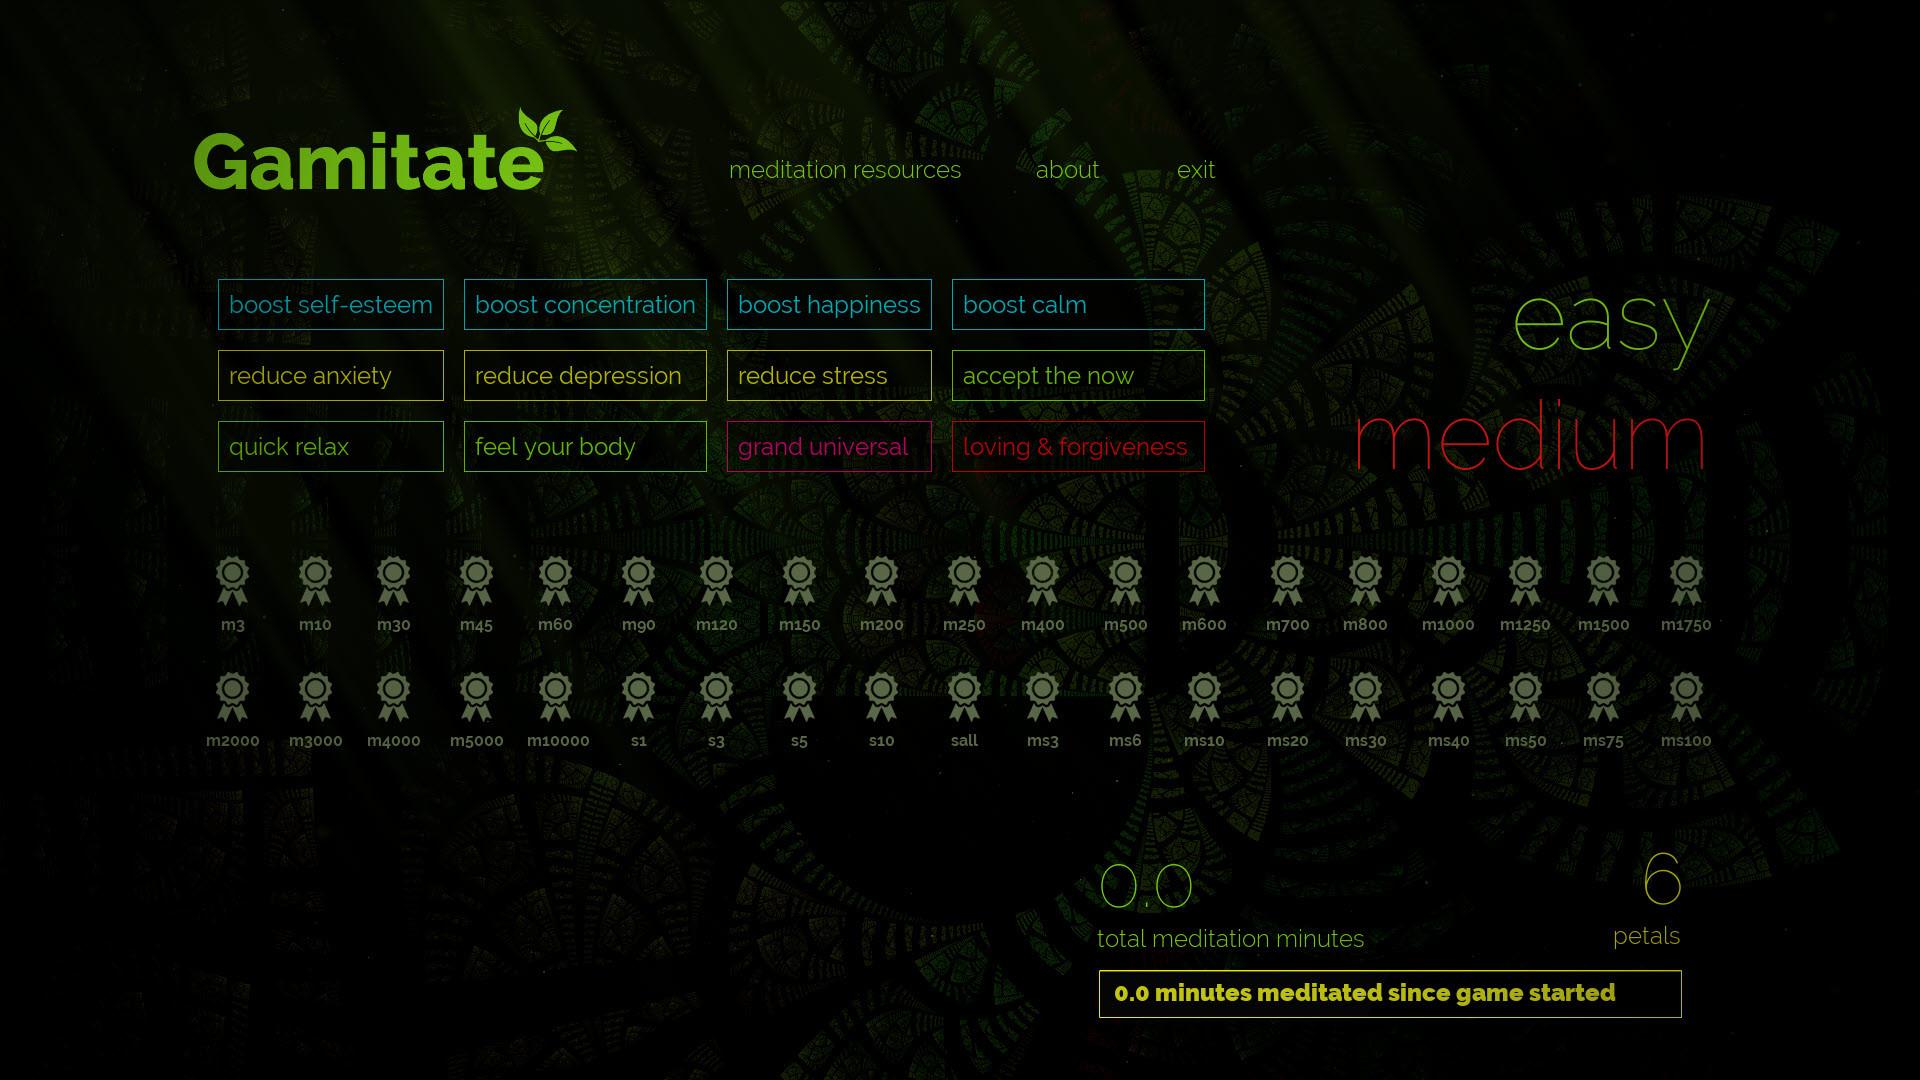 https://cdn.akamai.steamstatic.com/steam/apps/1370970/ss_81781b737d52183185e9cc4120abca700e8d2013.jpg?t=1621198418